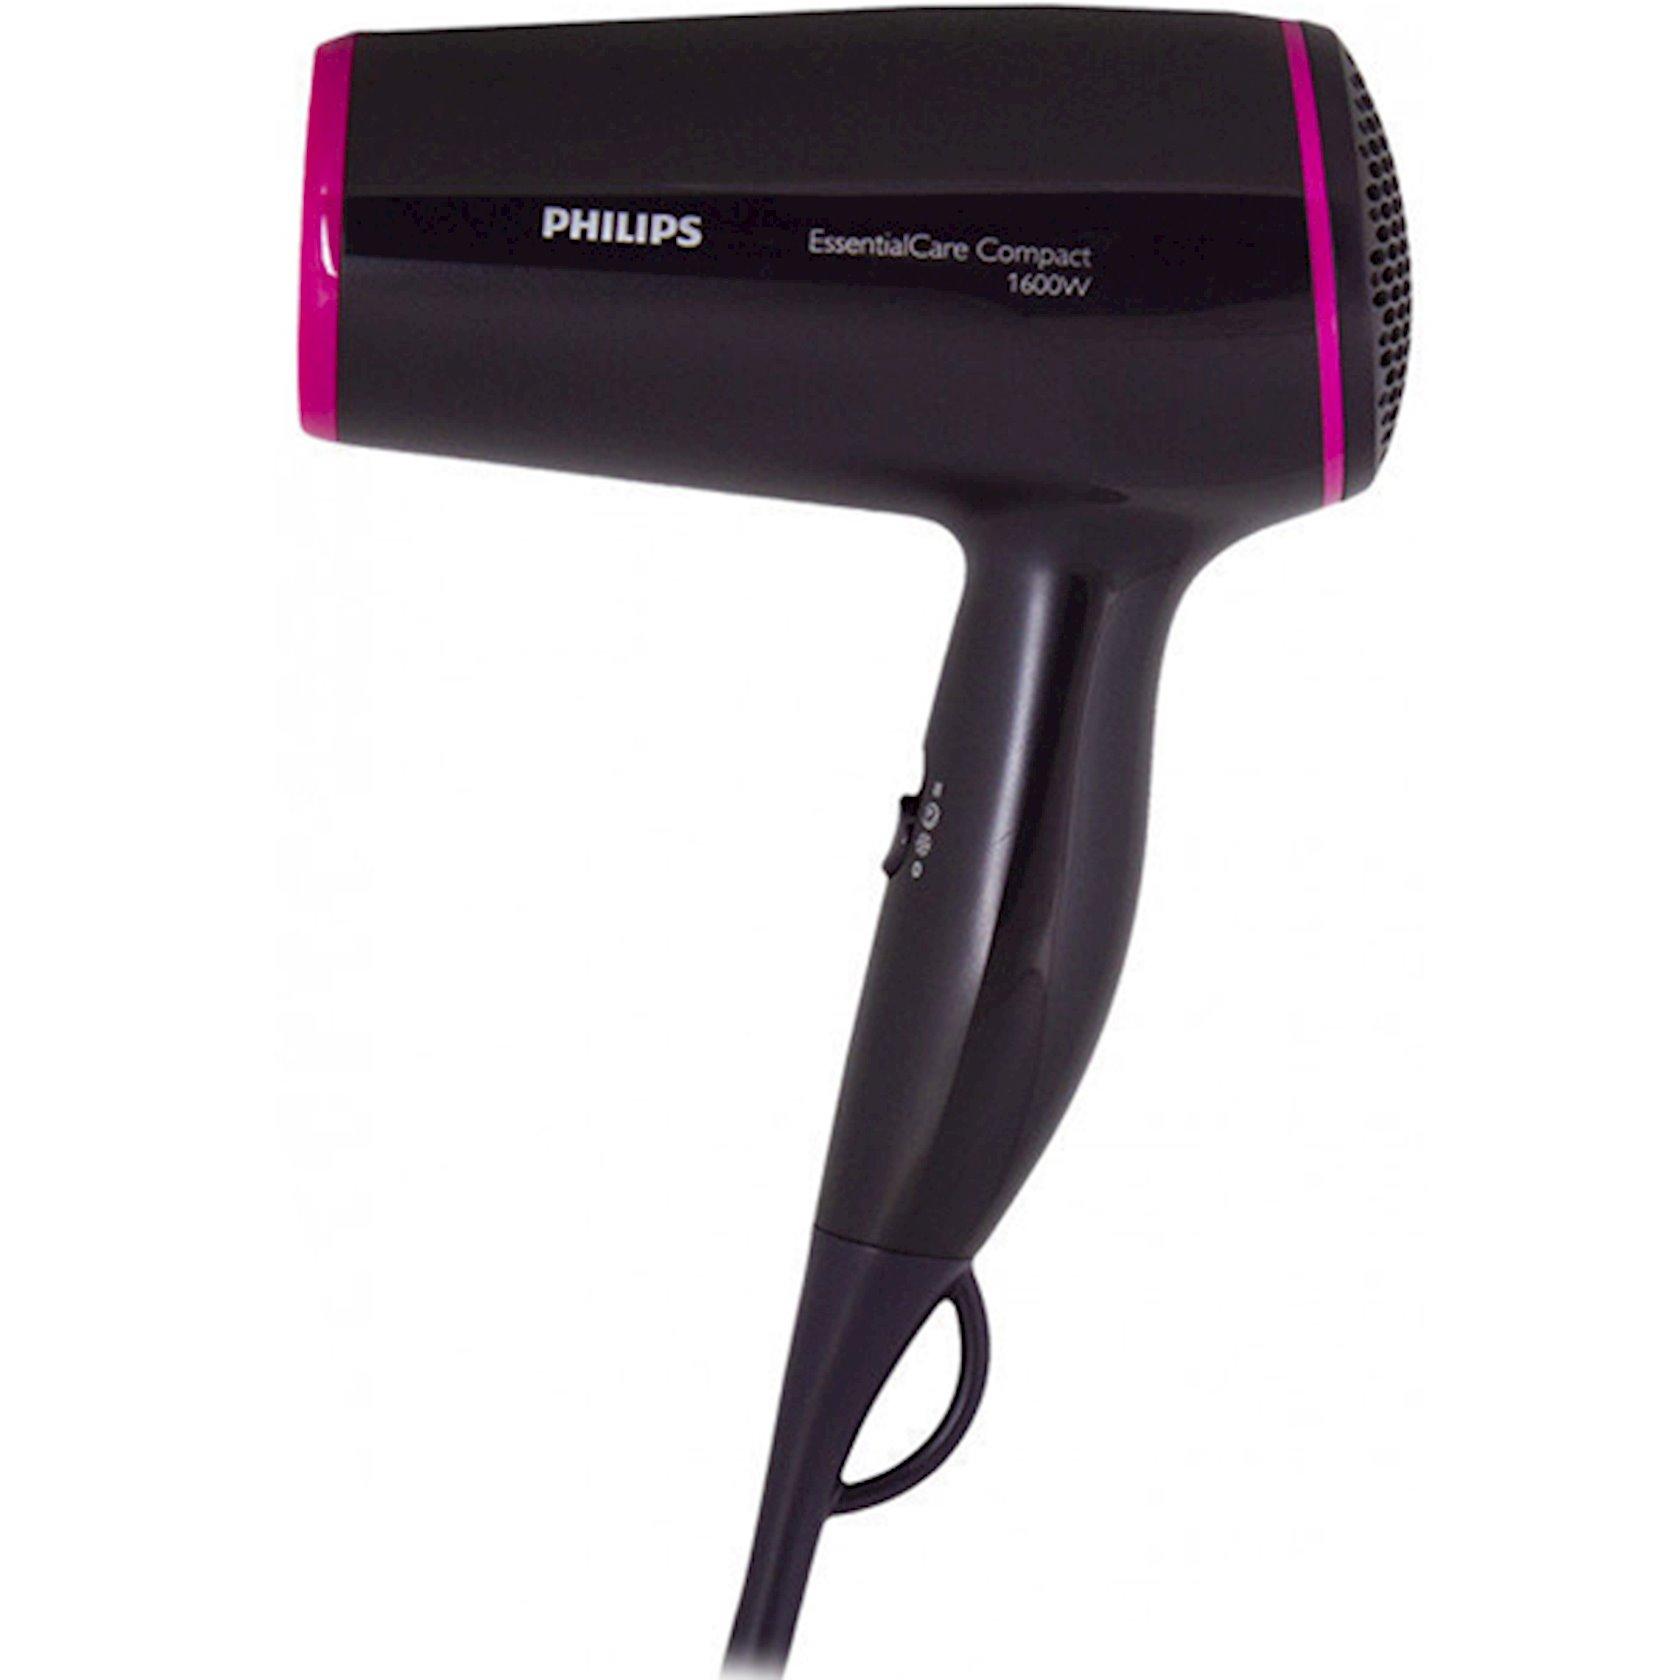 Fen Philips BHD002/00 DryCare Essential